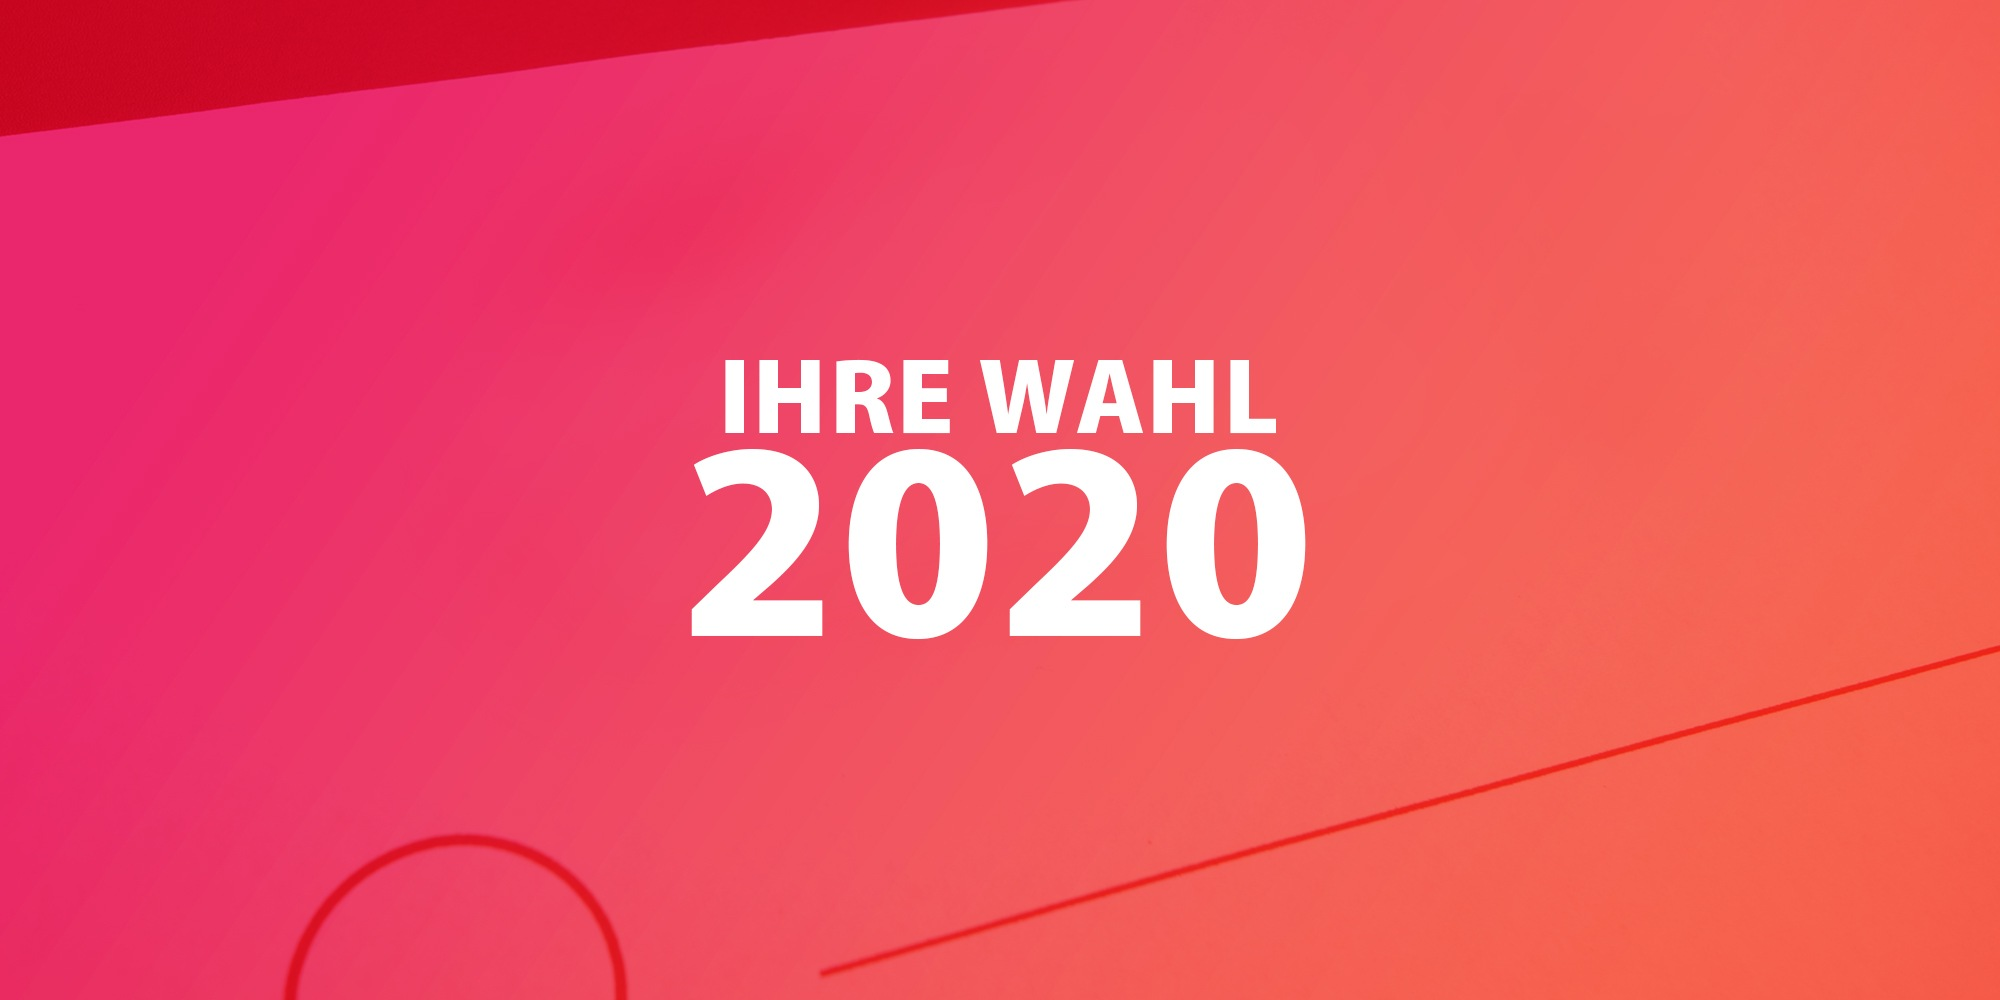 Kaufbeuren Kommunalwahl 2020 Kaufbeurer Initiative, Wahl 2020